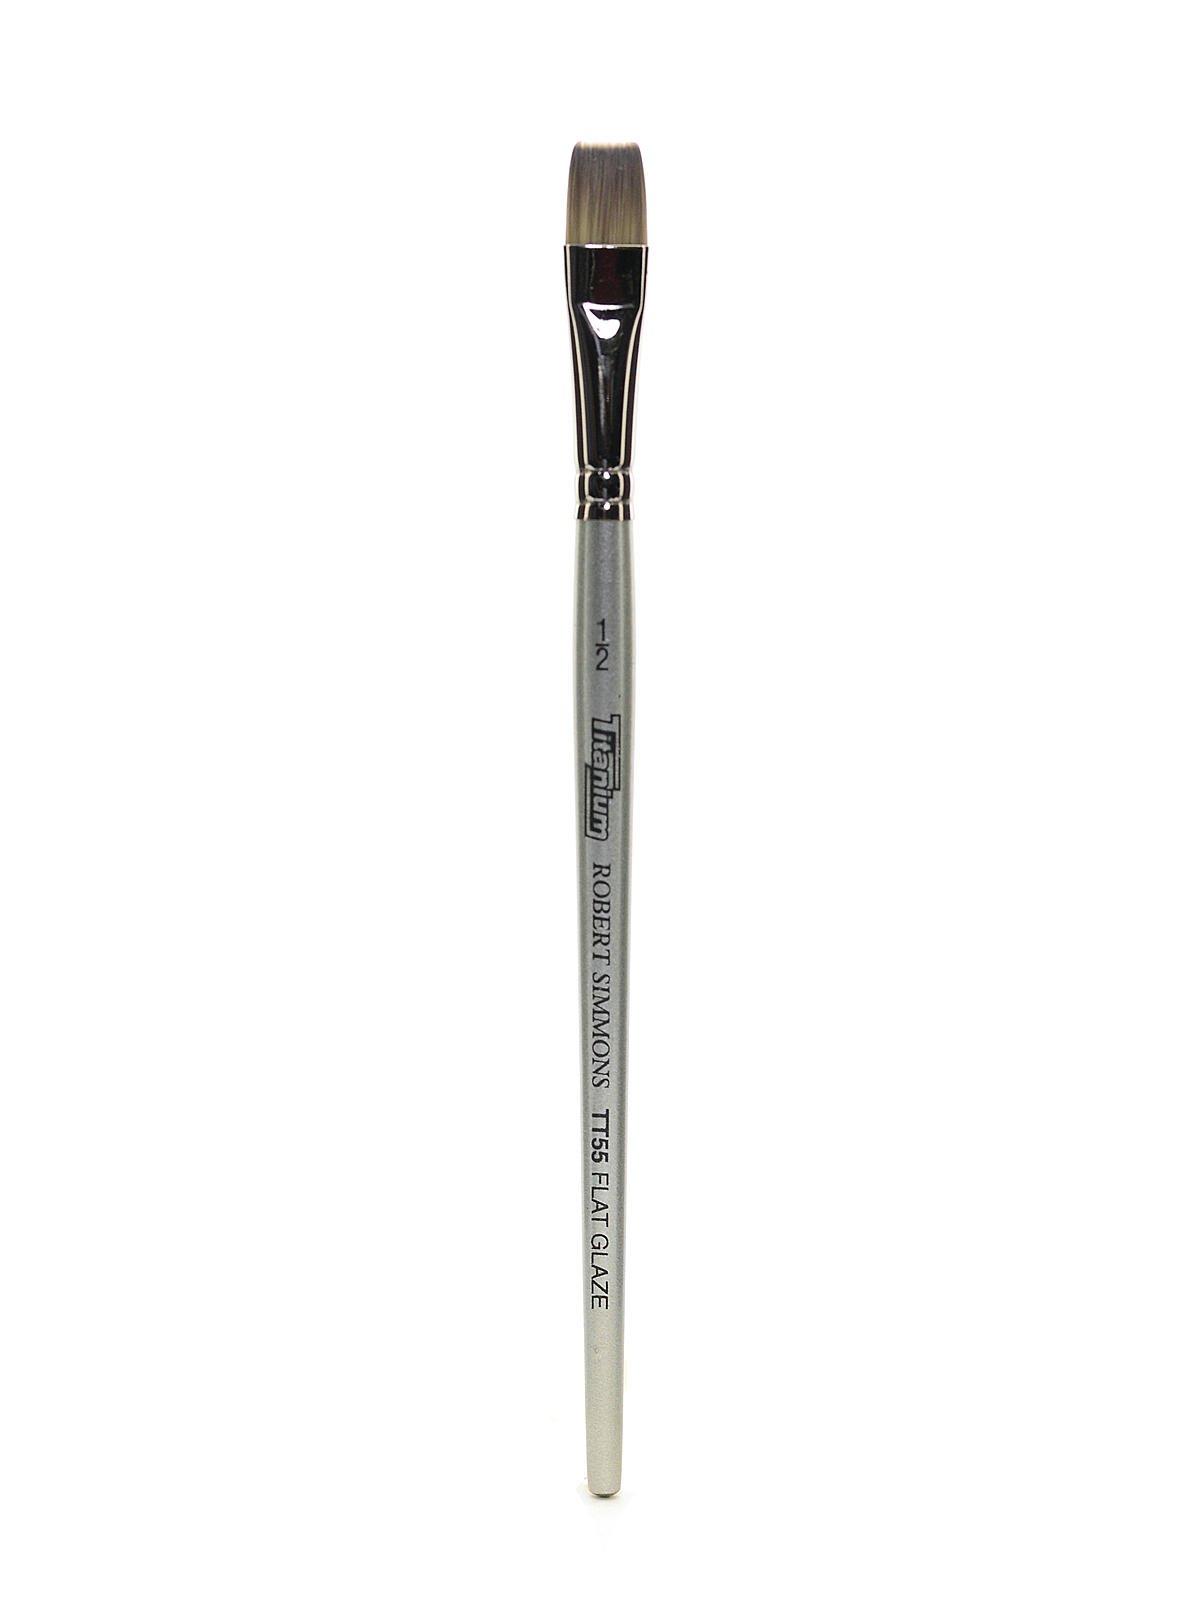 Robert Simmons Titanium Brushes Short Handle Single Stock 1/2 in. flat glaze TT55 [PACK OF 3 ]